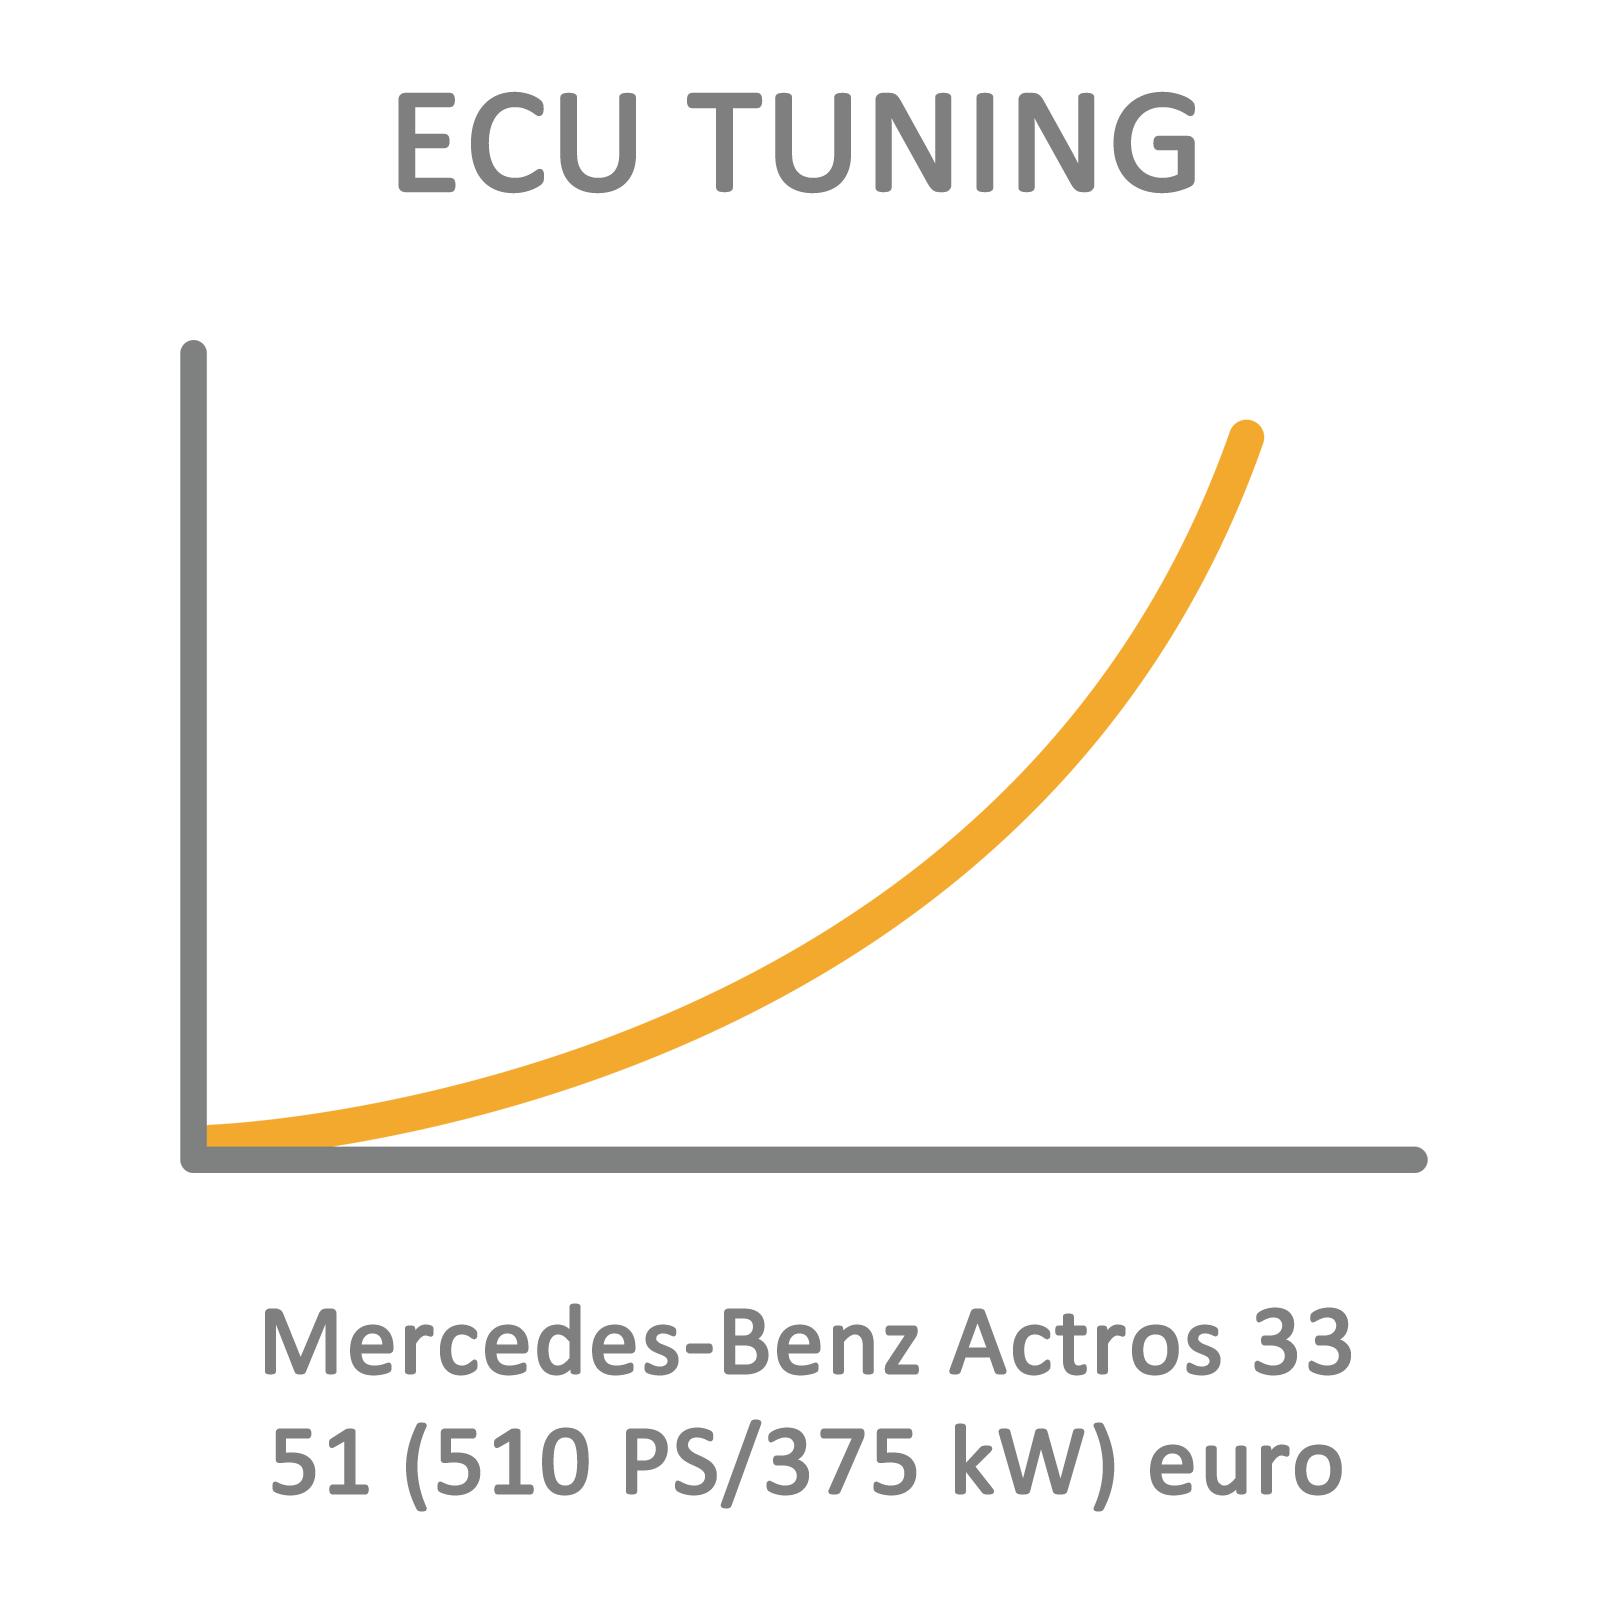 Mercedes-Benz Actros 33 51 (510 PS/375 kW) euro 4+5 ECU